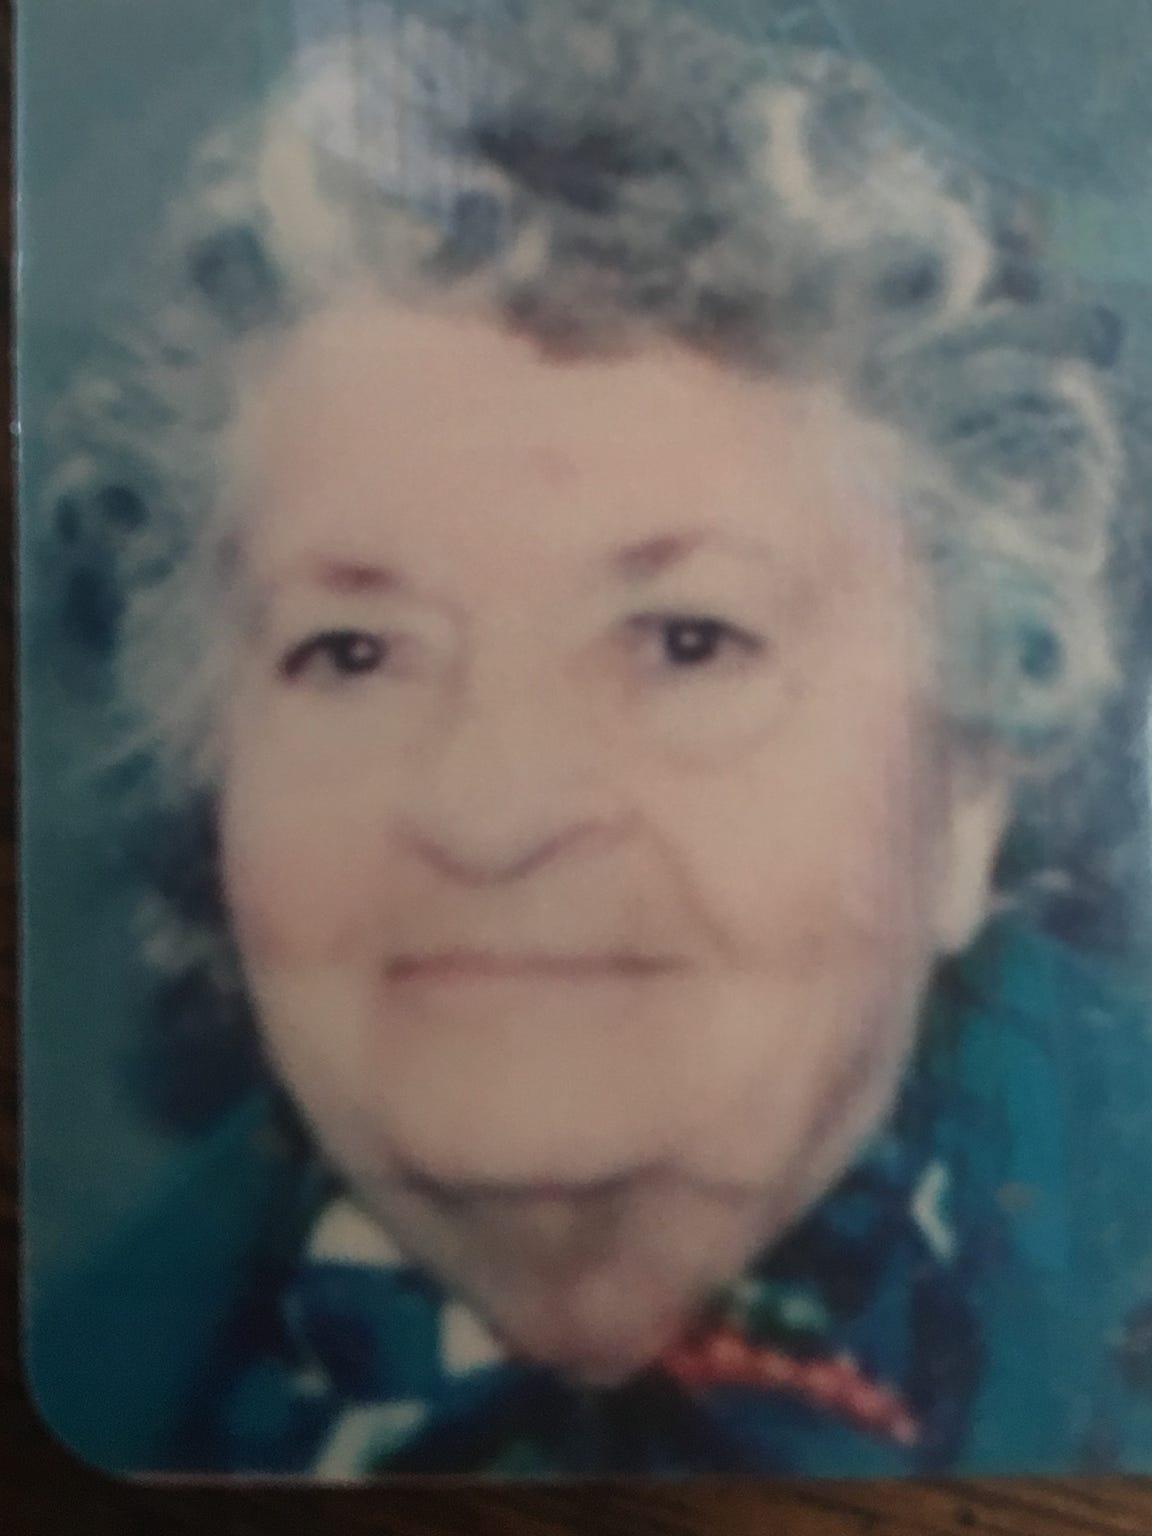 Marjorie Sansom, 91, was dying of dementia when Coachella